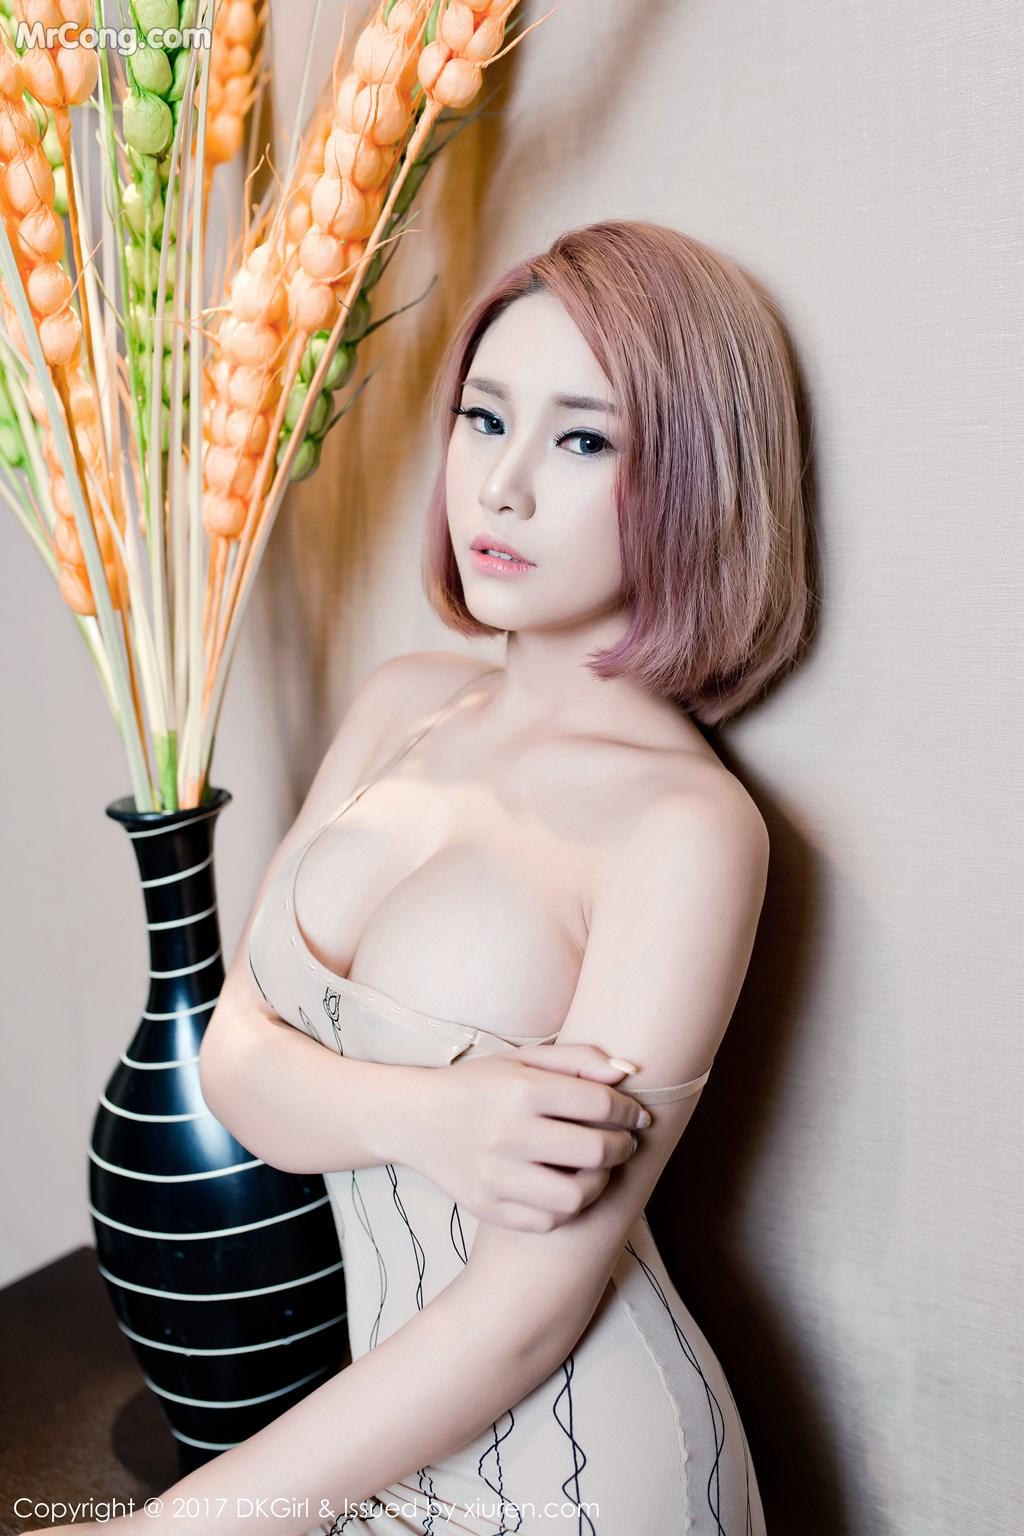 Image DKGirl-Vol.045-Meng-Bao-Er-BoA-MrCong.com-032 in post DKGirl Vol.045: Người mẫu Meng Bao Er (萌宝儿BoA) (56 ảnh)